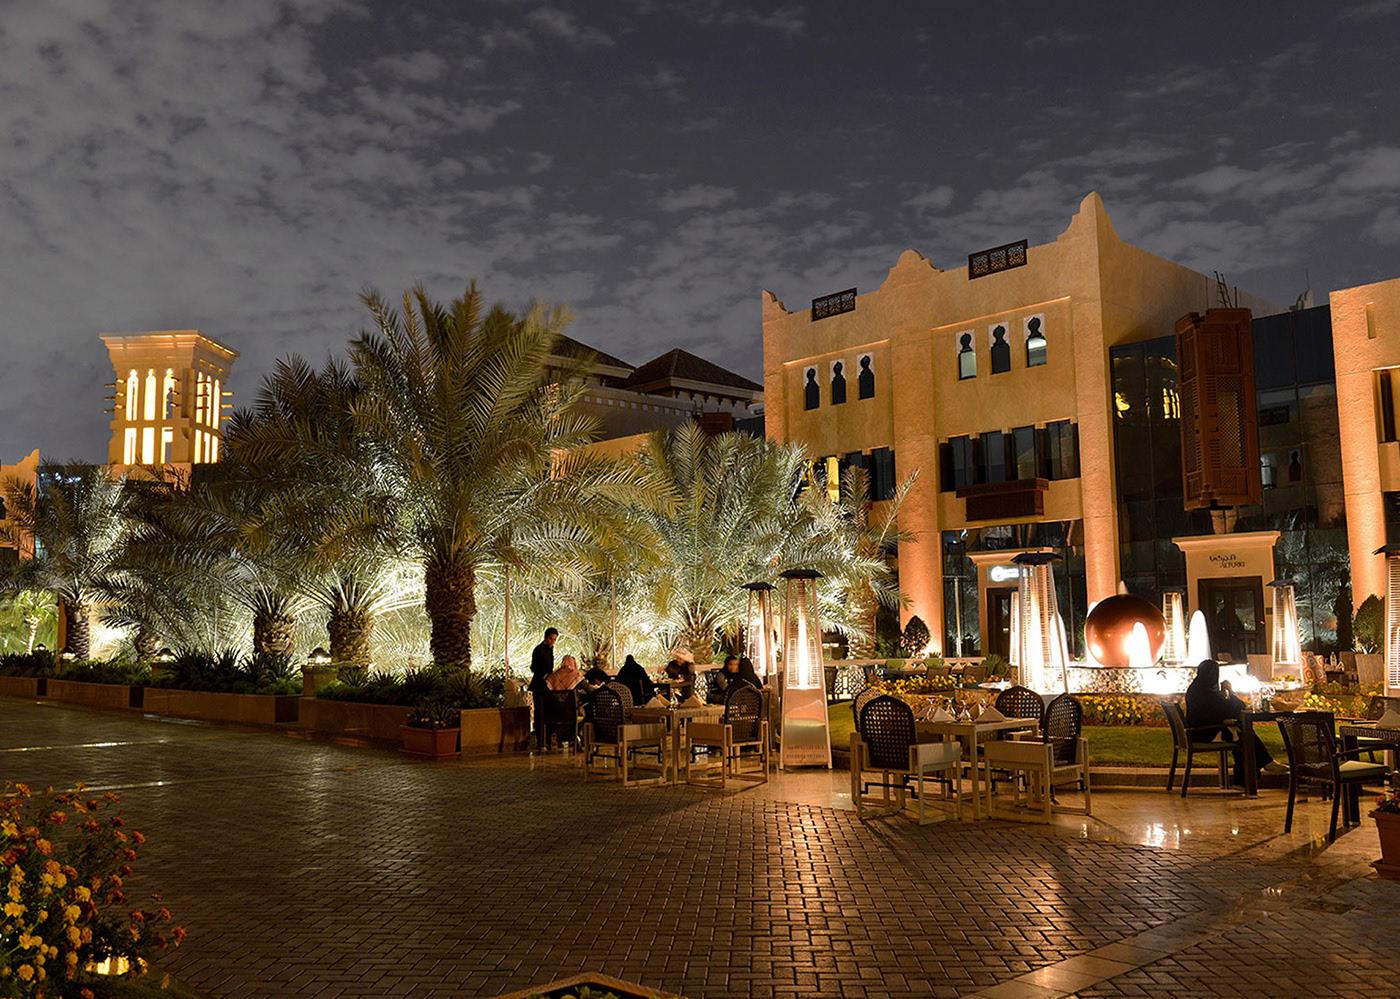 Al Mashreq Boutique Hotel